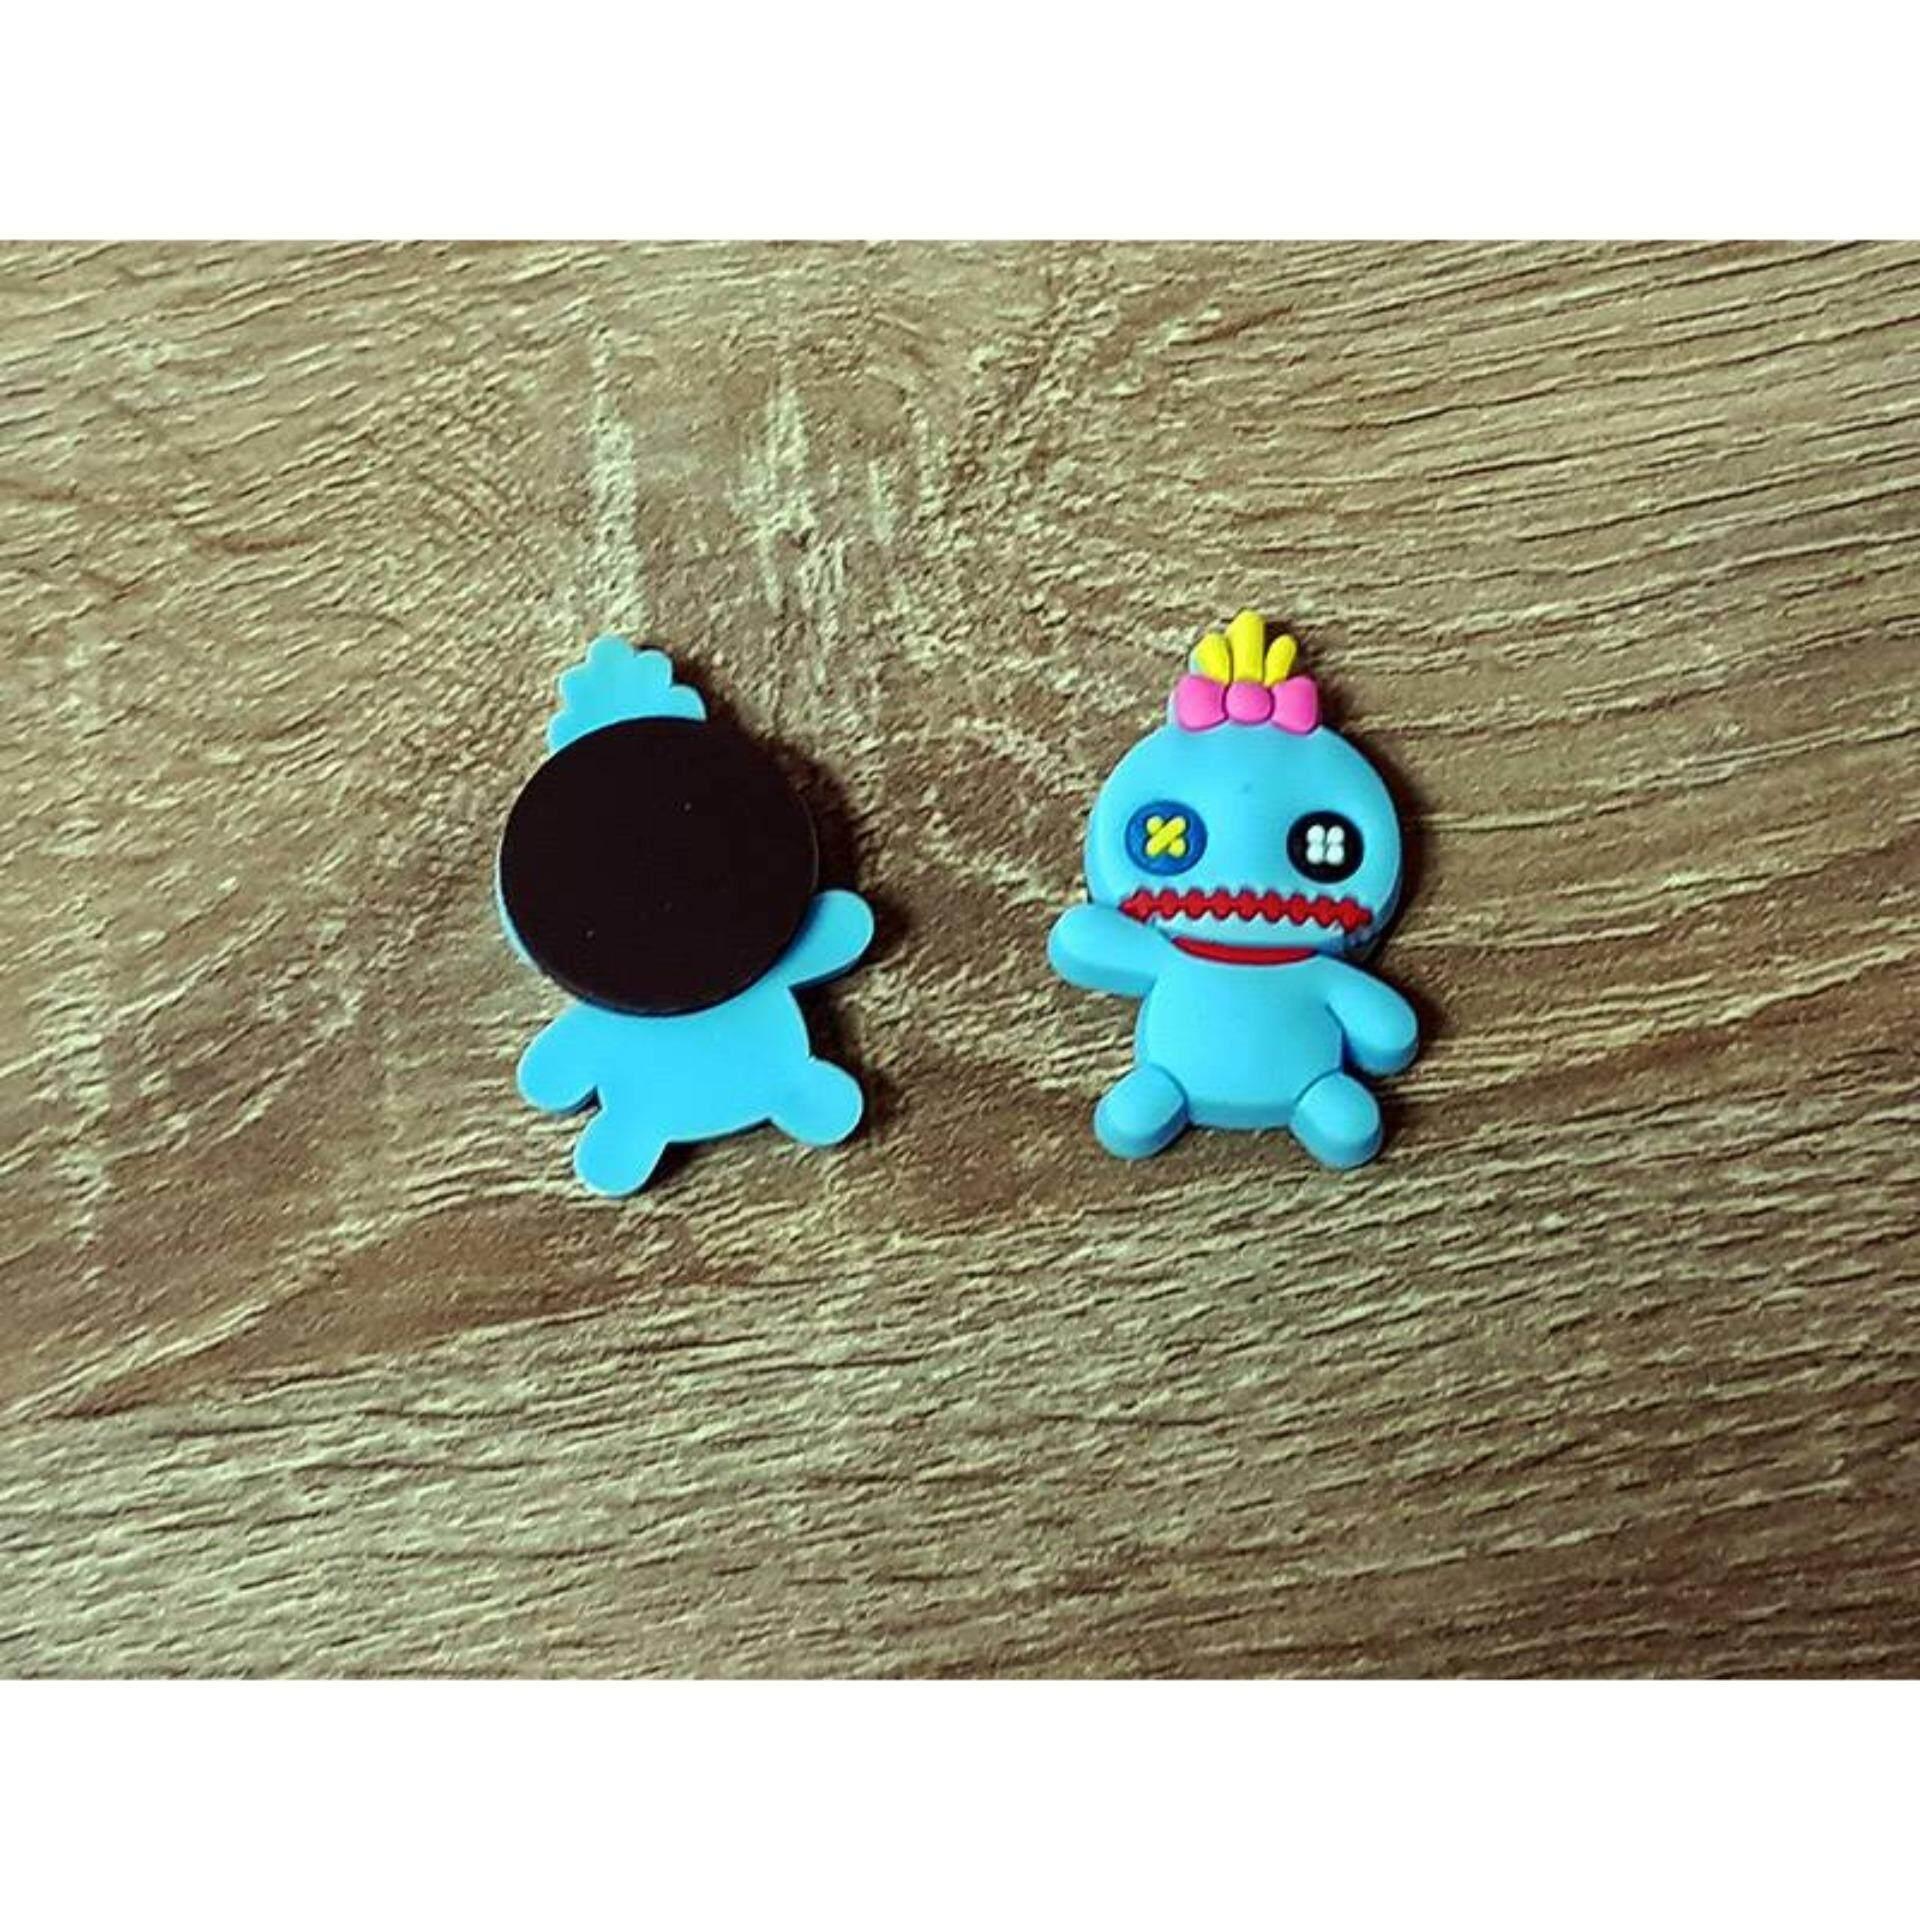 Cute Fridge Magnet